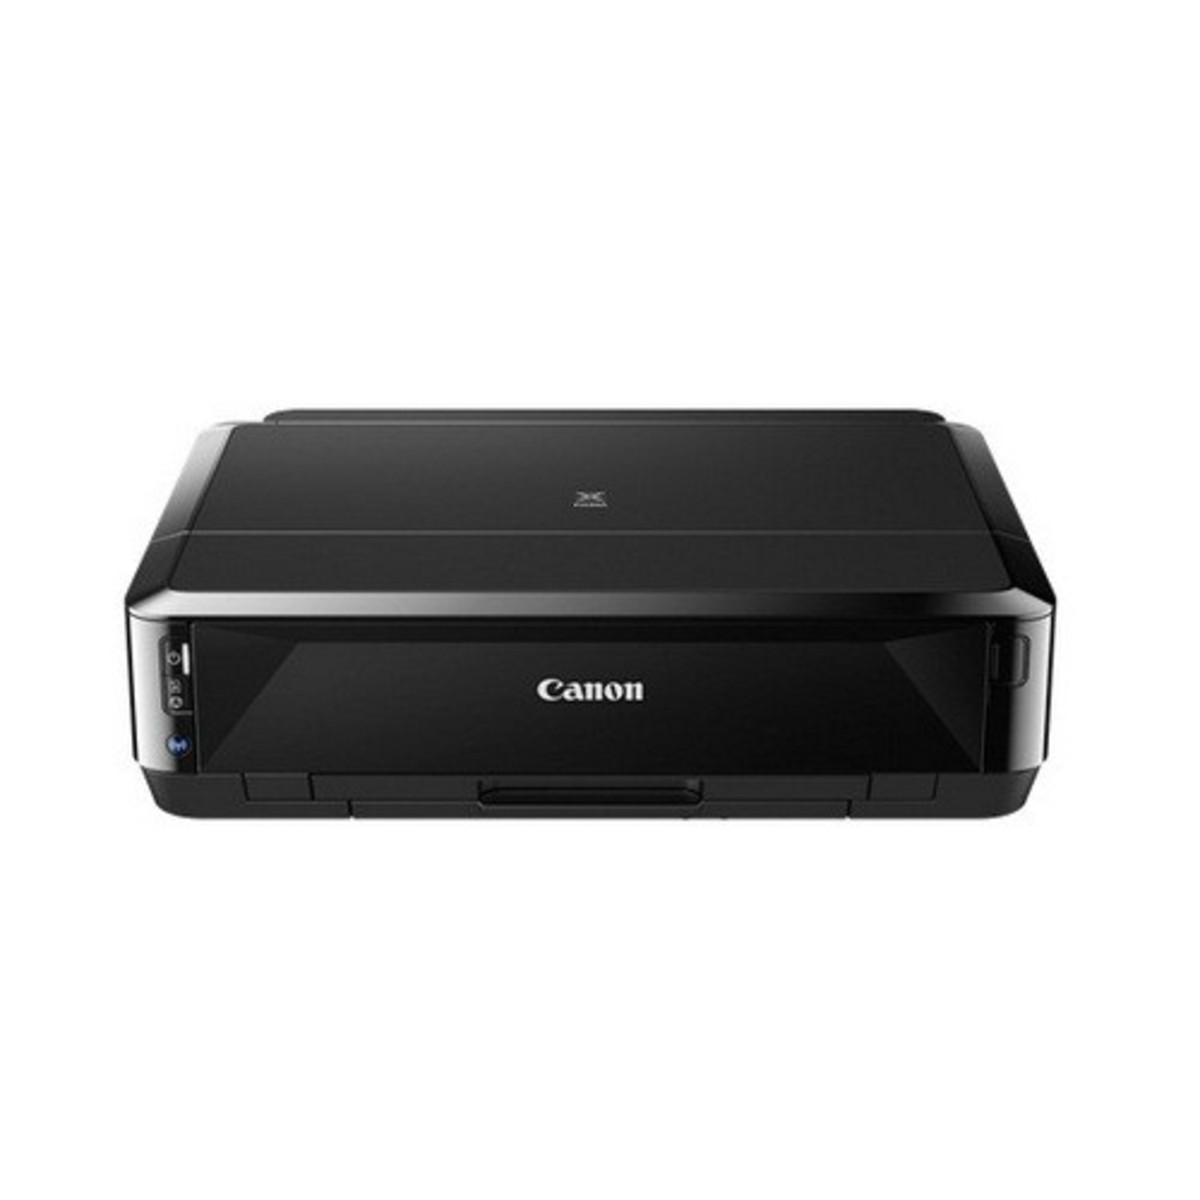 Canon Pixma IP7260 Advanced Inkjet Printer